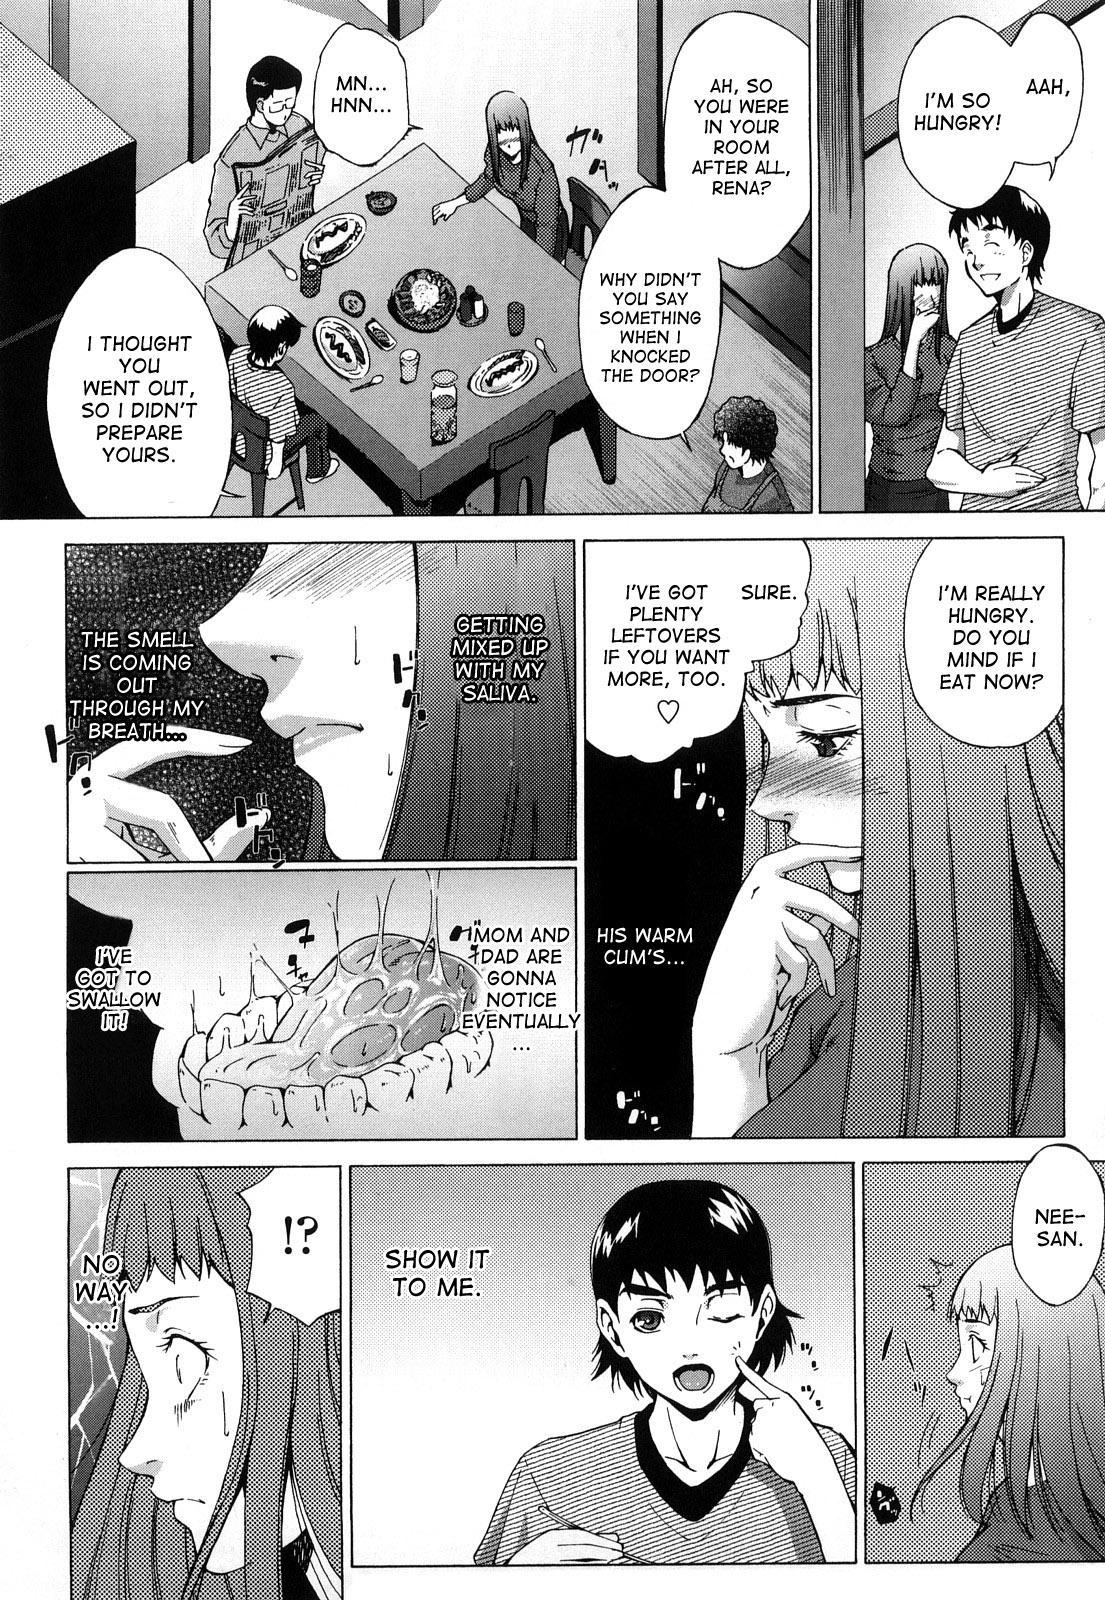 [Touma Itsuki] Ane-sama Inkou - Sister's Sexy Smell [English] {desudesu} 154